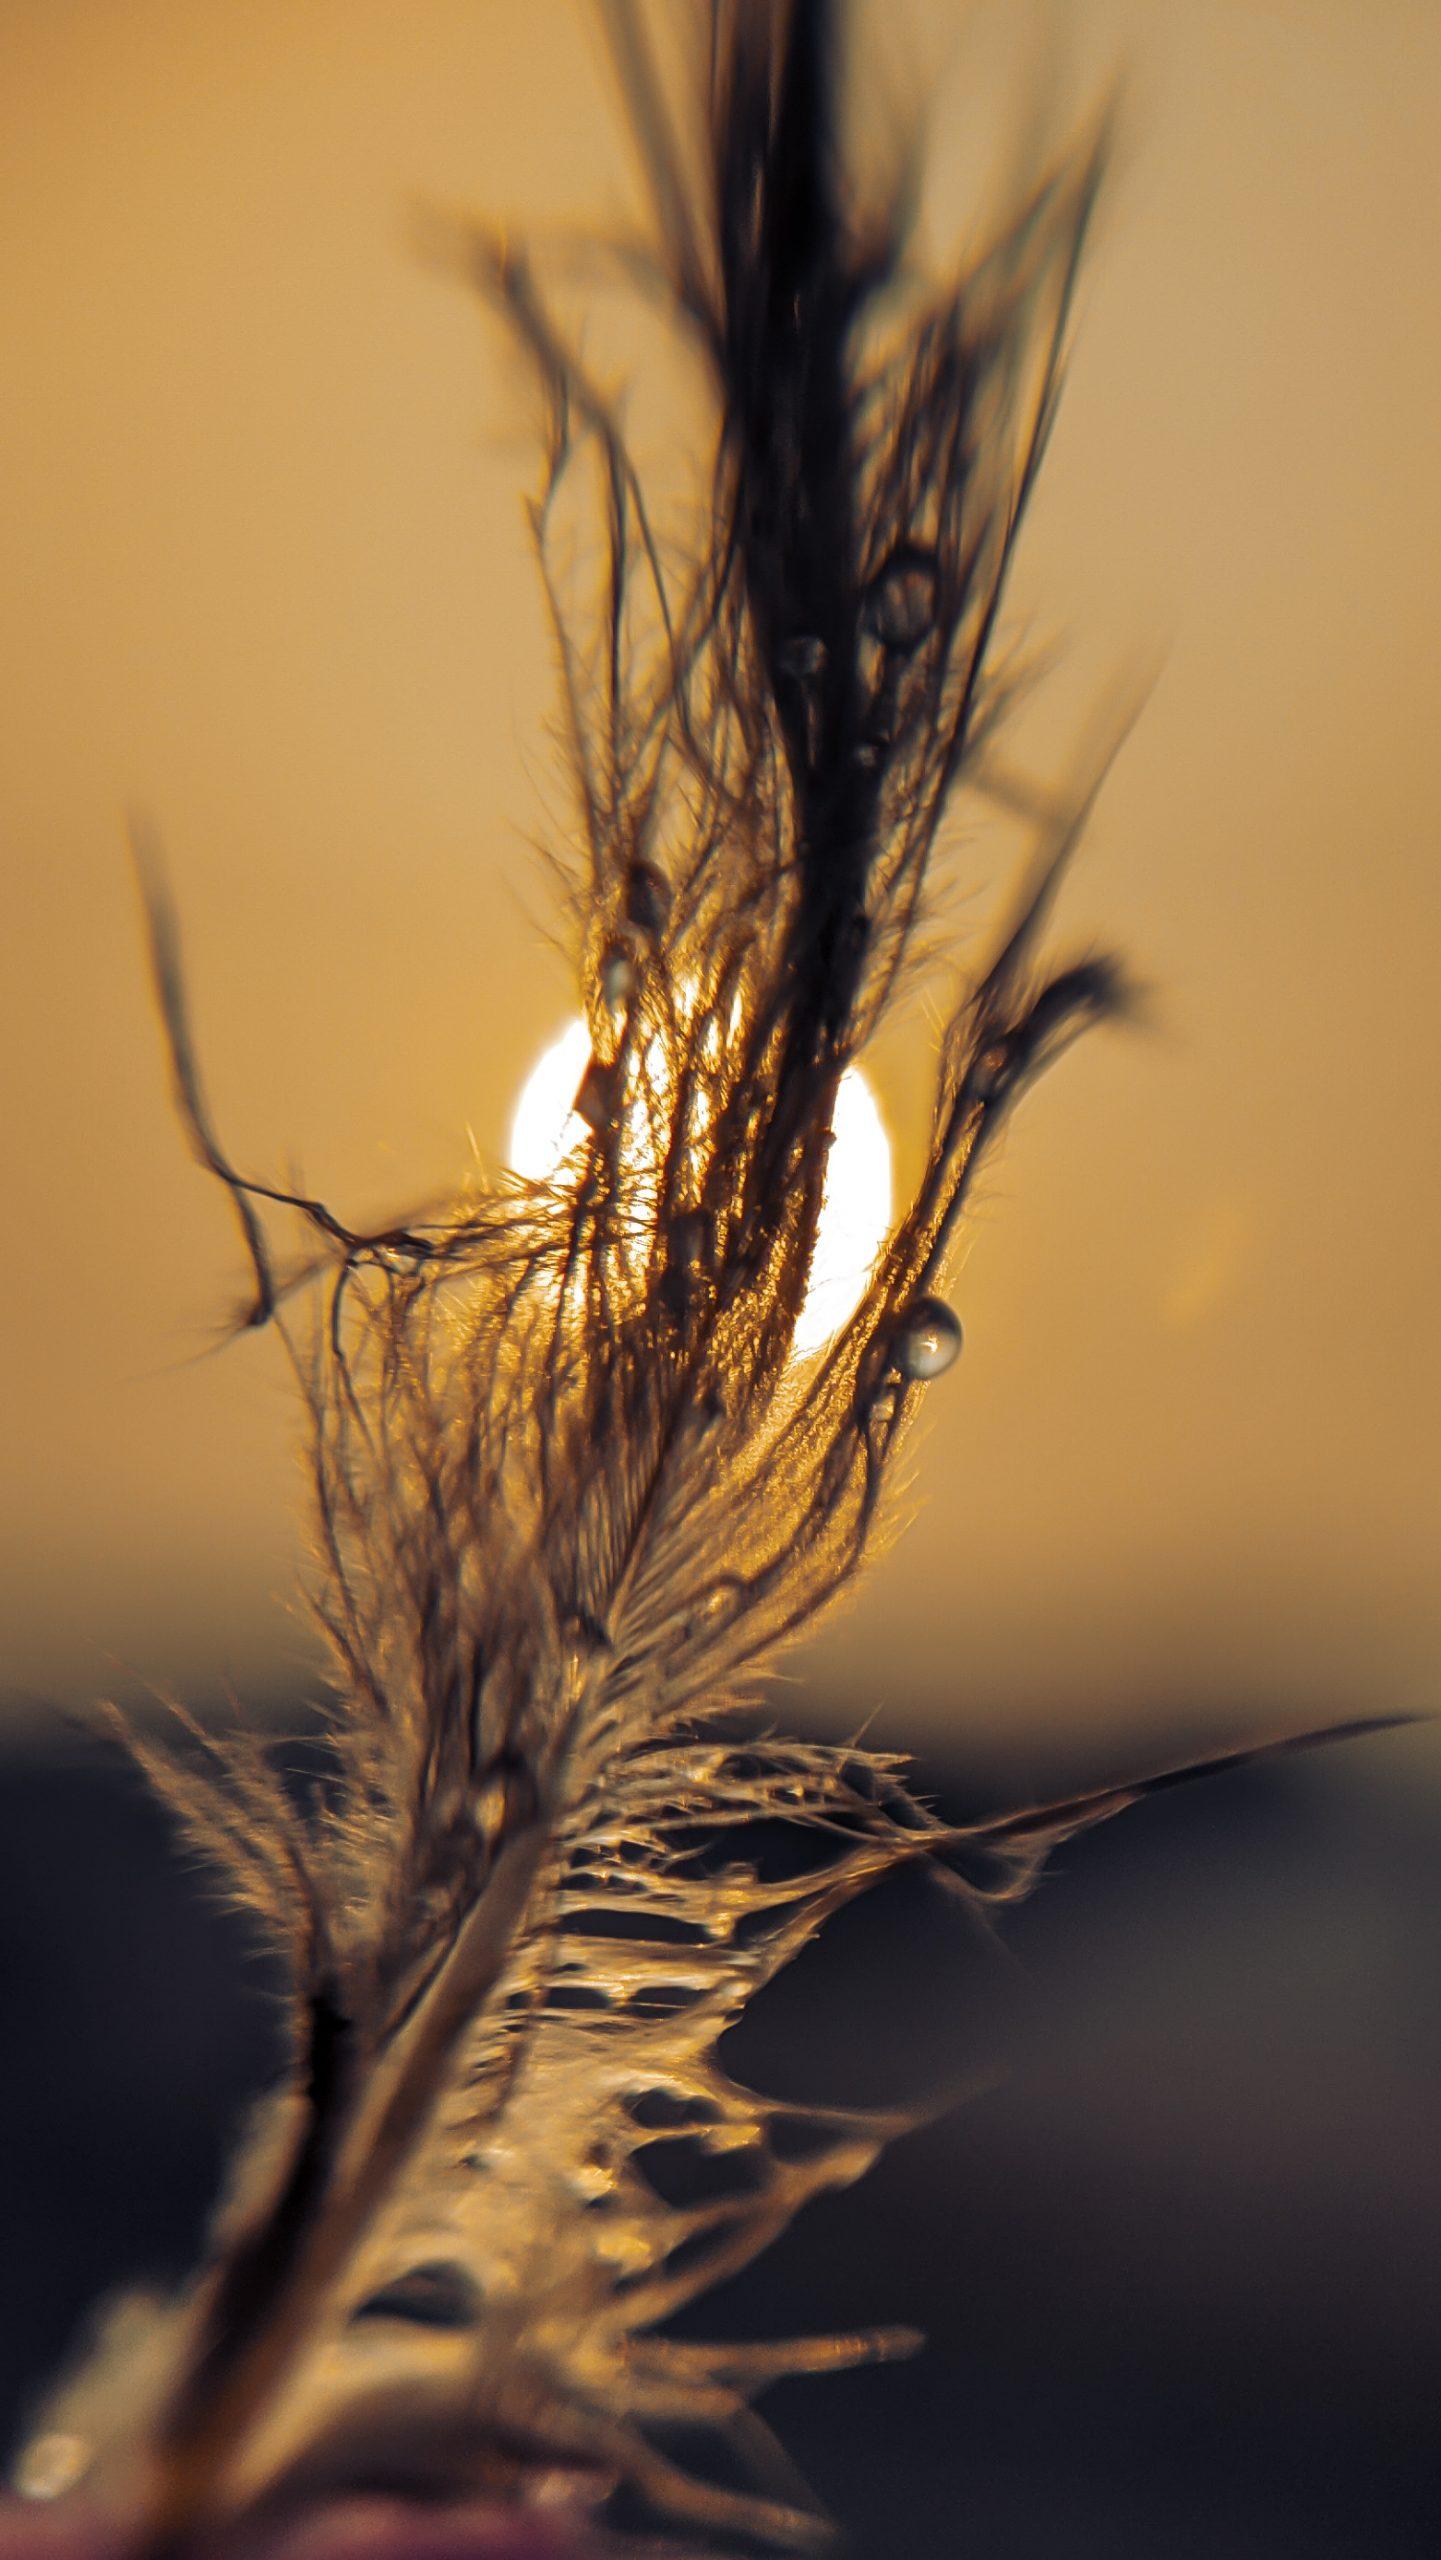 Wings hiding sun